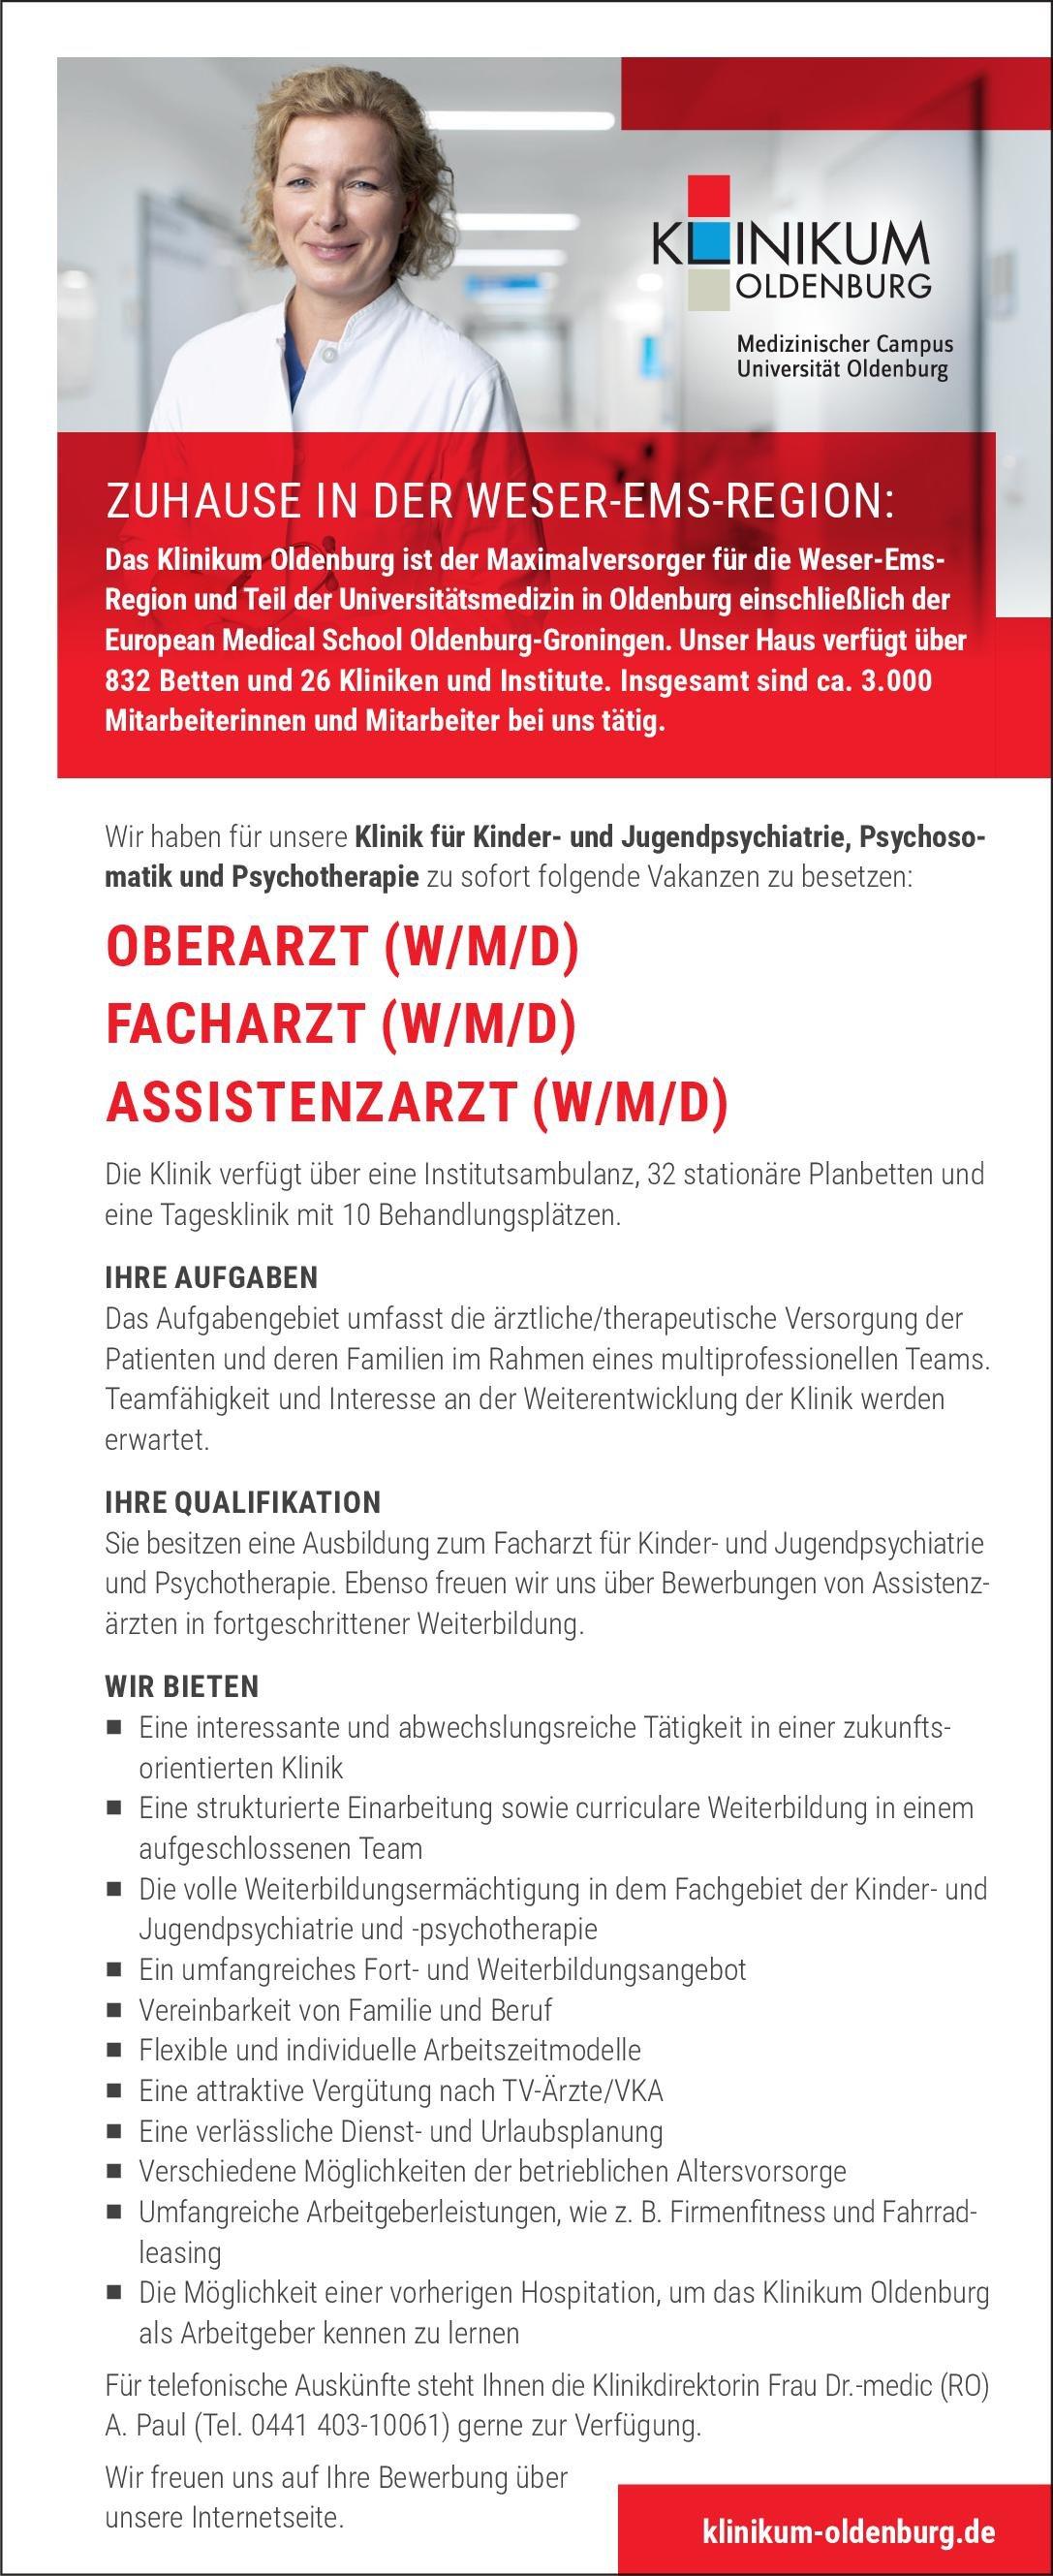 Klinikum Oldenburg AöR Oberarzt (w/m/d) Kinder- und Jugendpsychiatrie, Psychosomatik und Psychotherapie Kinder- und Jugendpsychiatrie und -psychotherapie, Psychosomatische Medizin und Psychotherapie Oberarzt